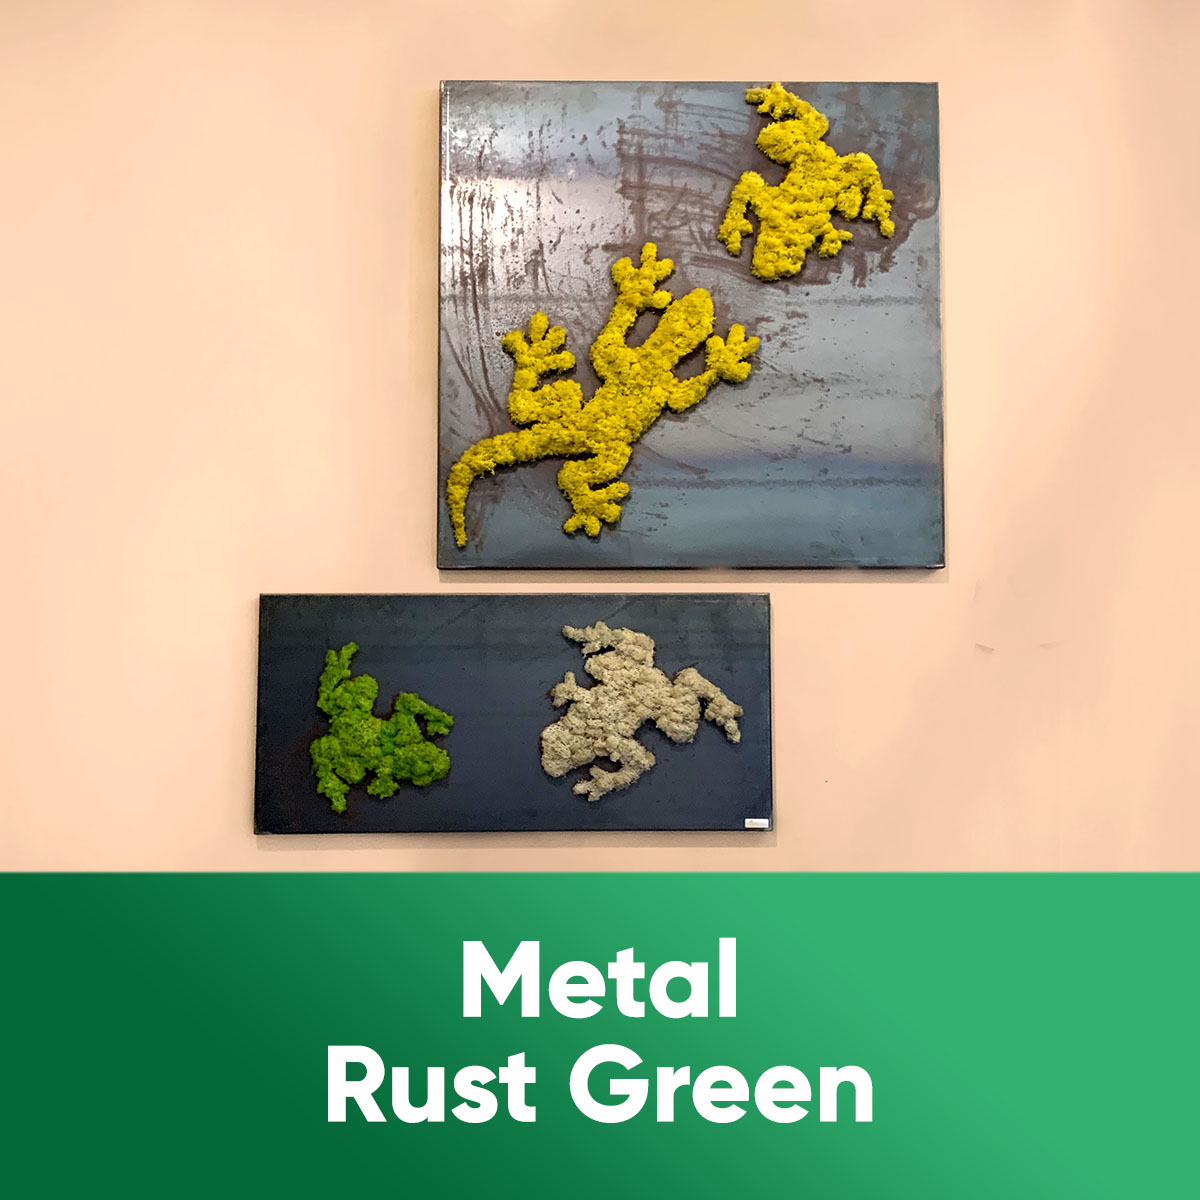 METAL RUST GREEN